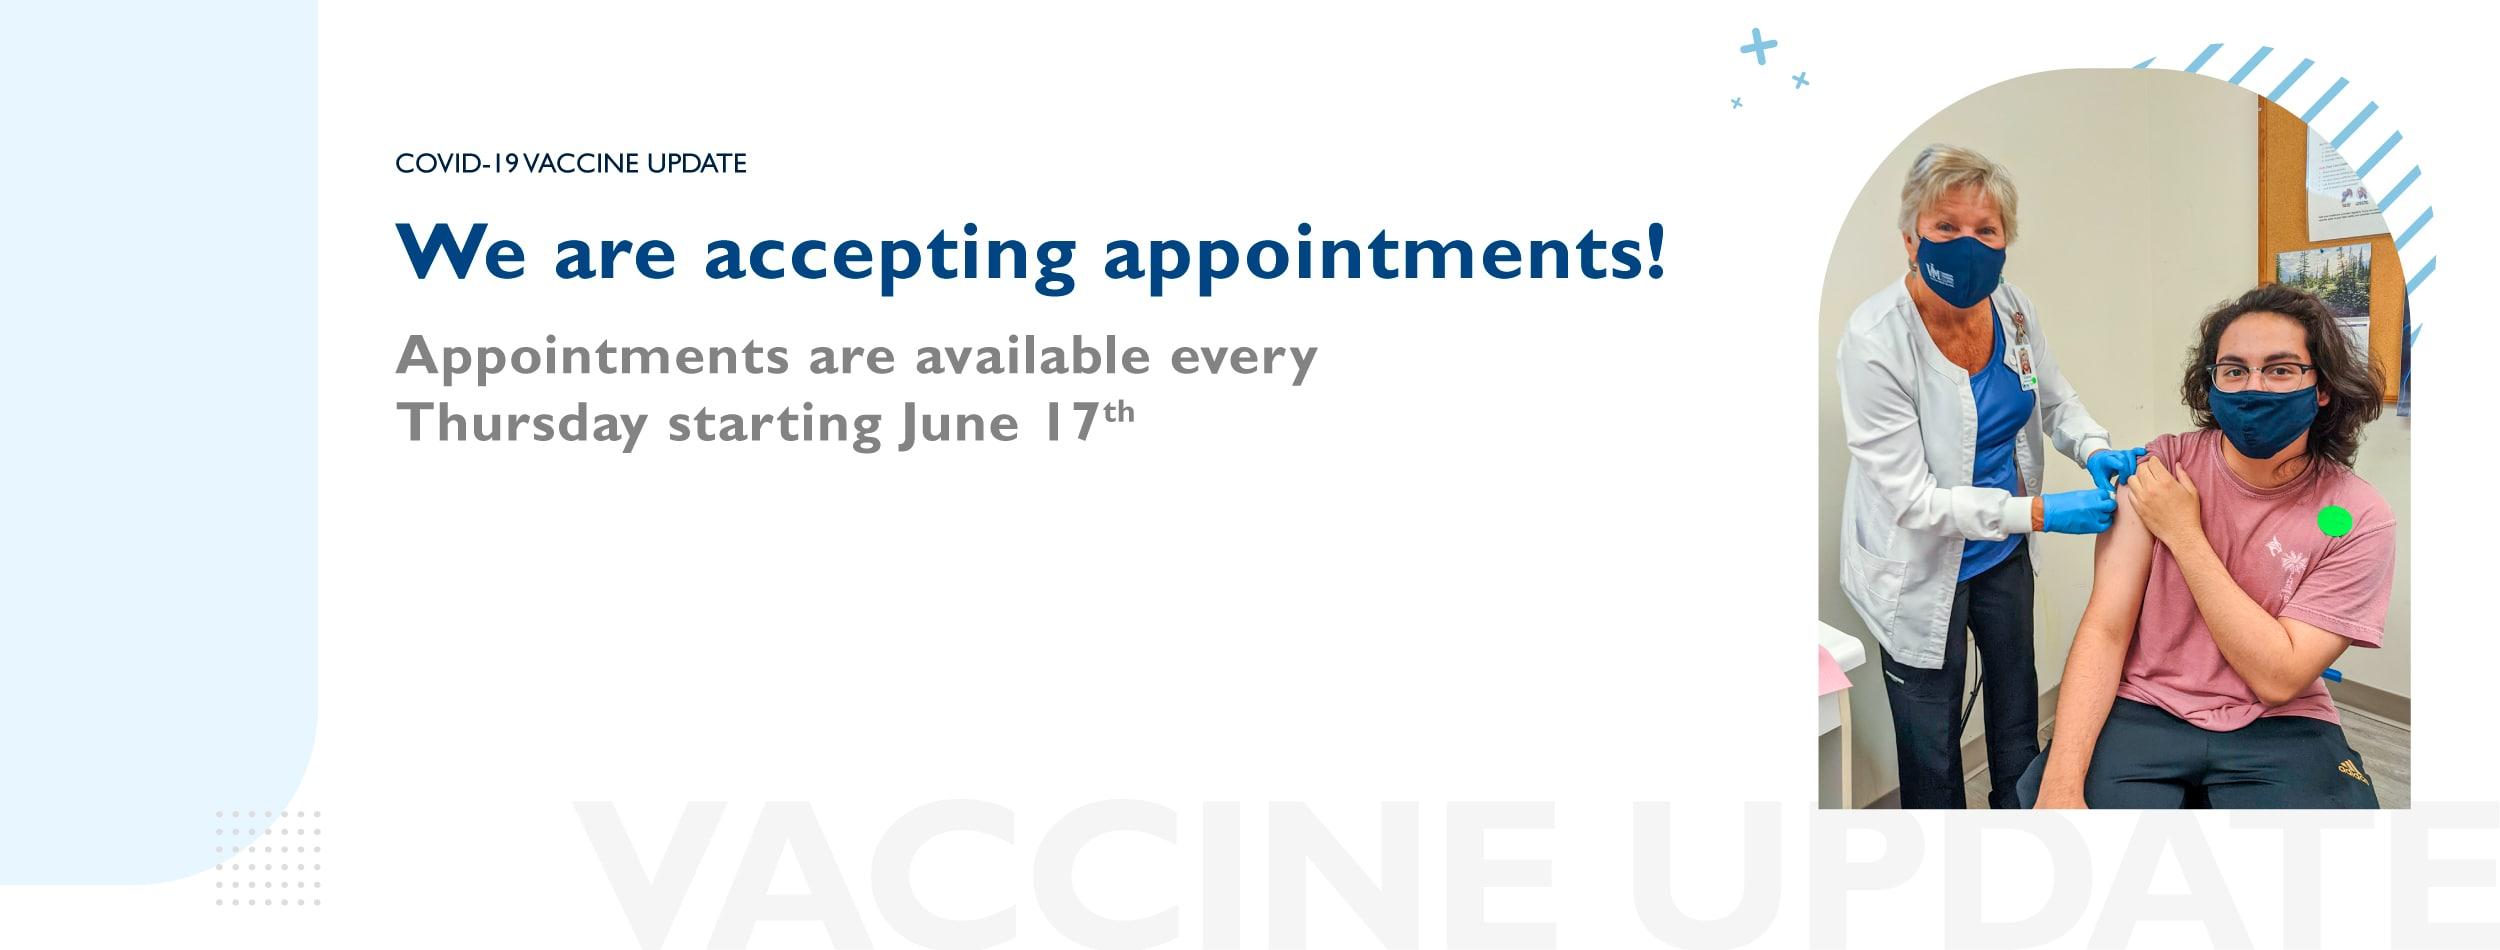 COVID-19 Vaccine Update June 2021 | Volunteers in Medicine Clinic Hilton Head Island VIM